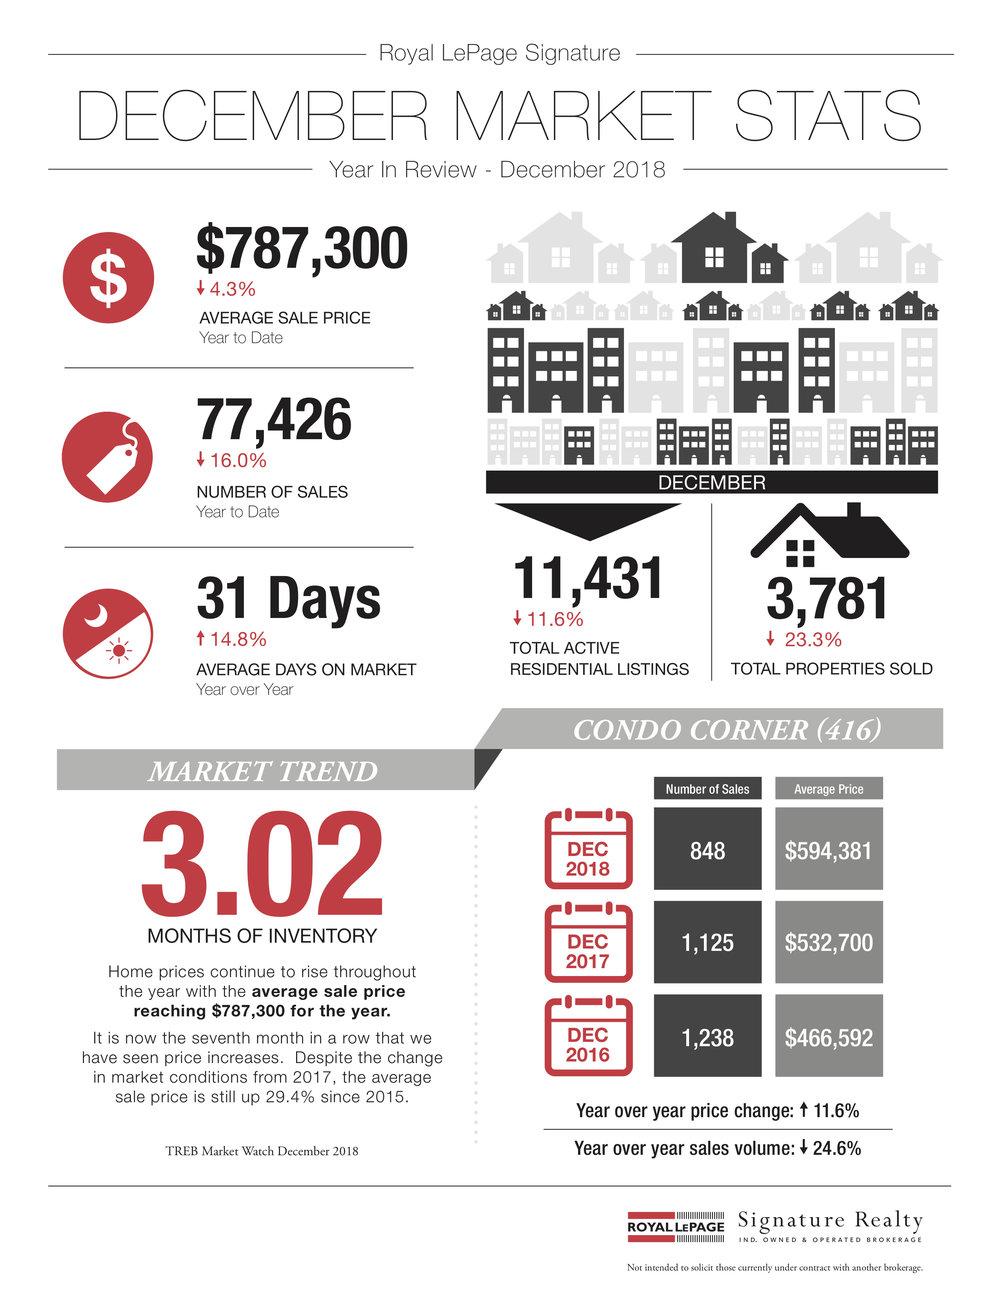 RLP Infographic.jpg